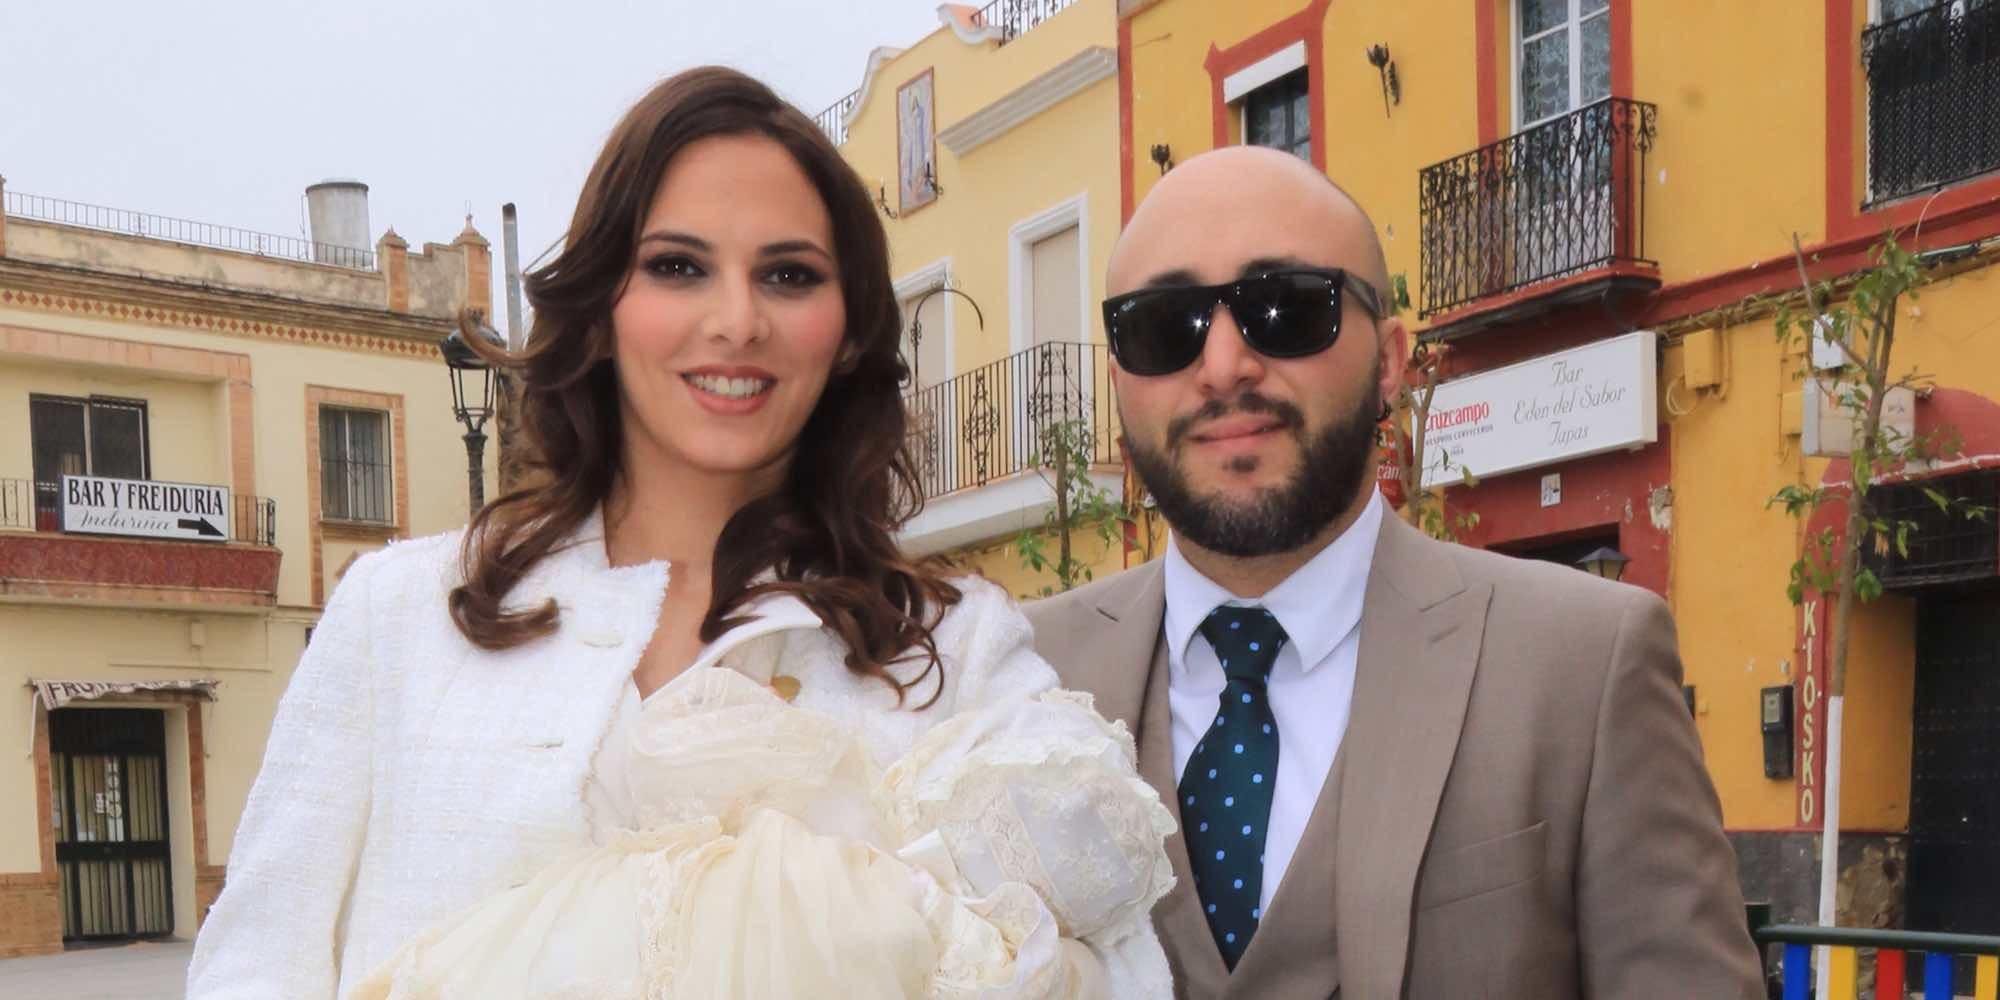 Kiko Rivera e Irene Rosales bautizan a su hija Carlota con cuatro grandes ausencias